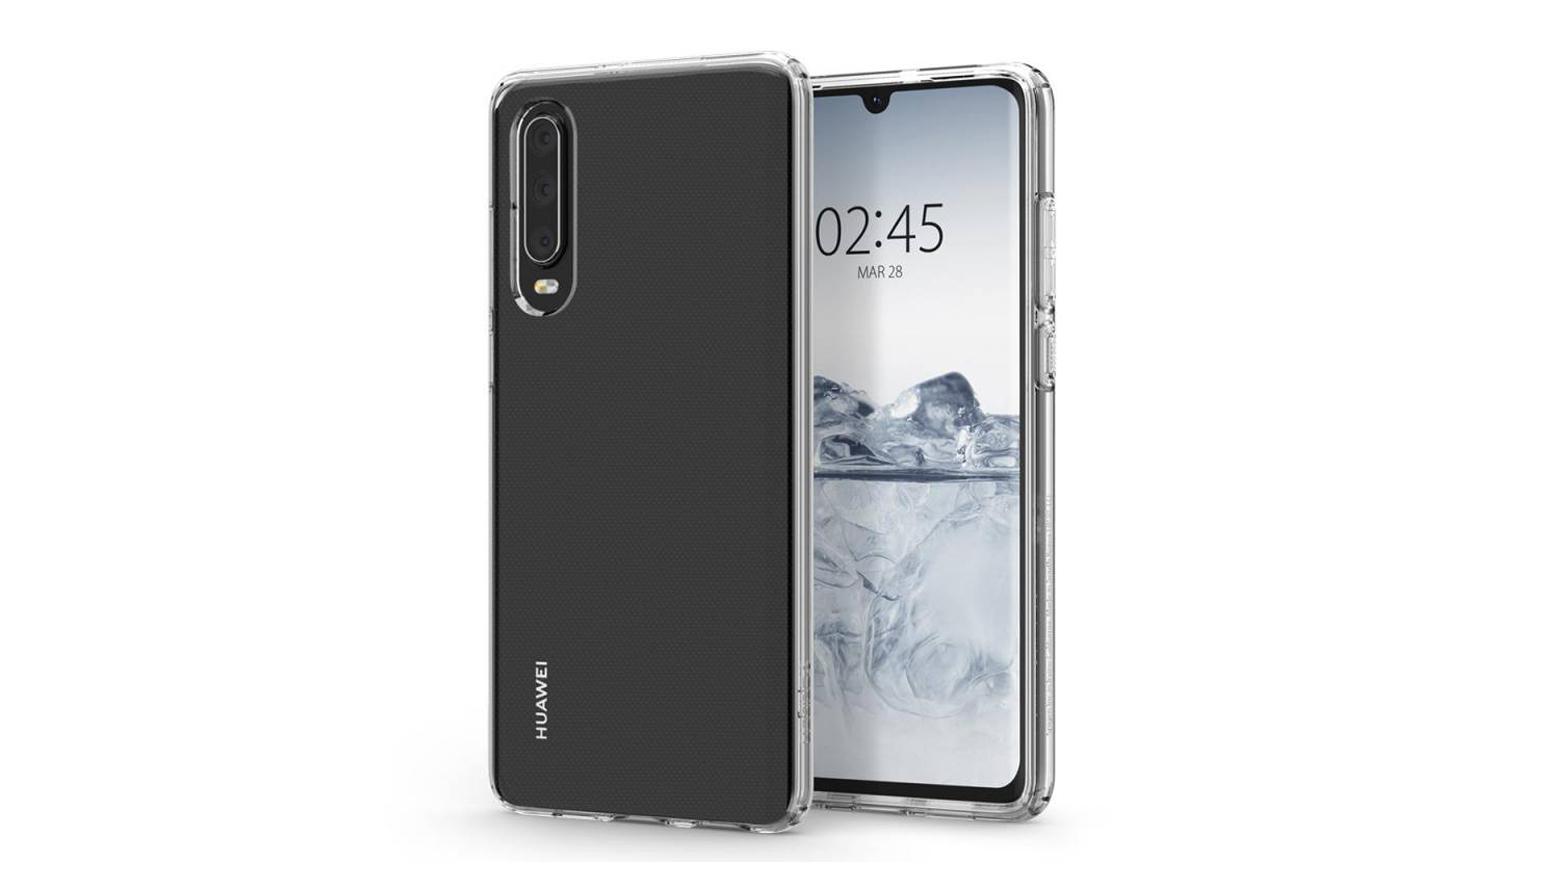 Huawei P30 Pro Price in Nepal